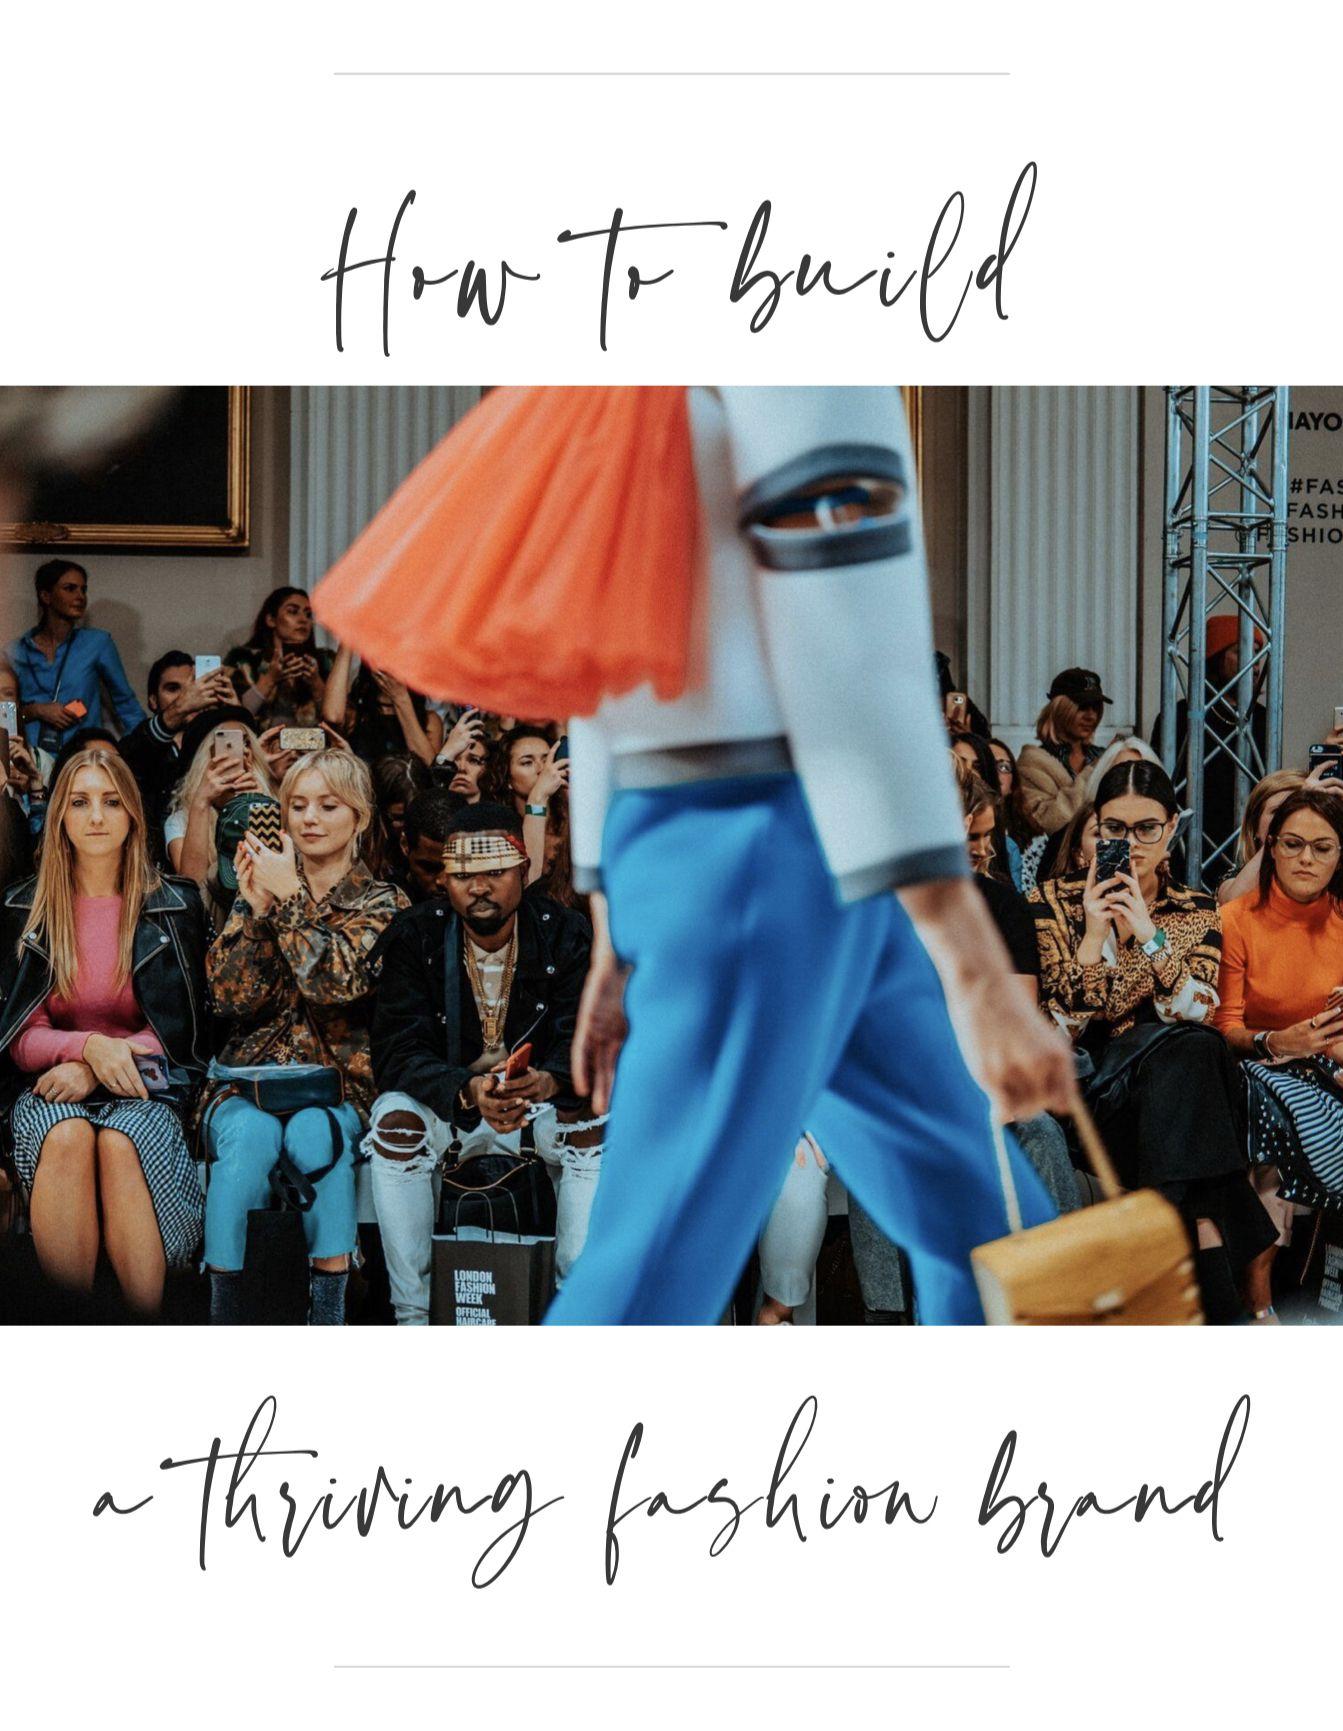 #fashiondesign #fashiondesigners #clothingline #branding